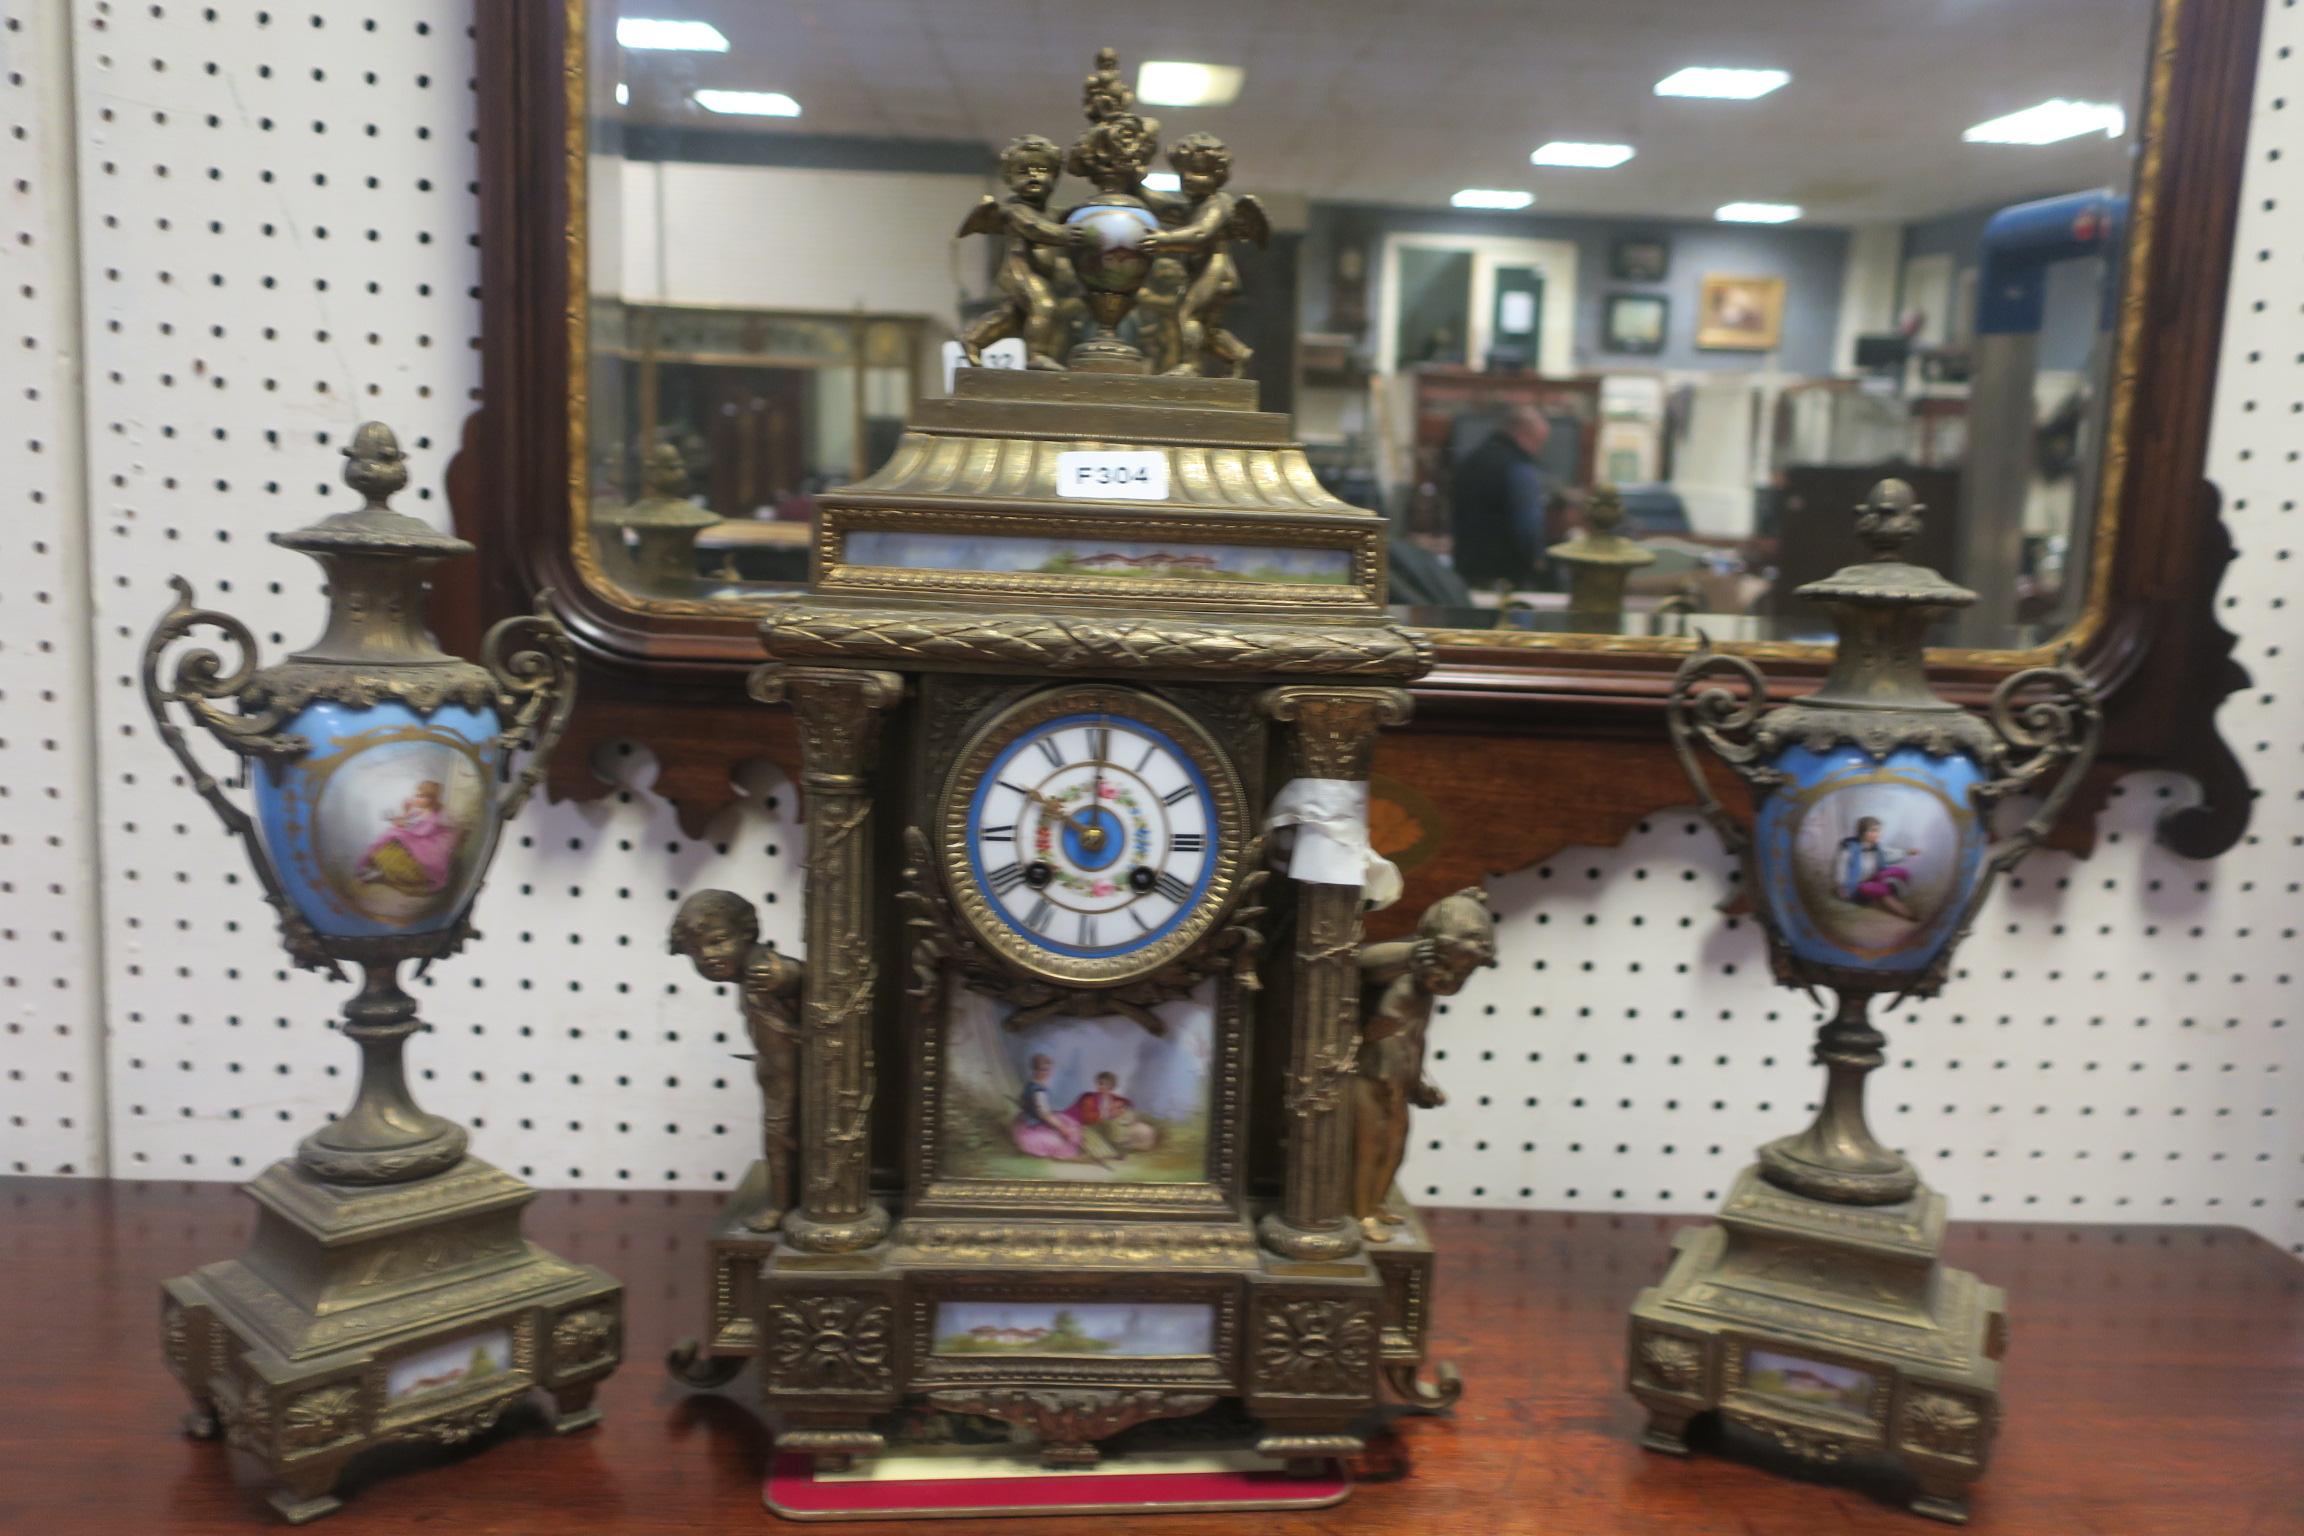 Lot 198 - A 19th CENTURY GILT METAL AND PORCELAIN CLOCK GARNITURE,